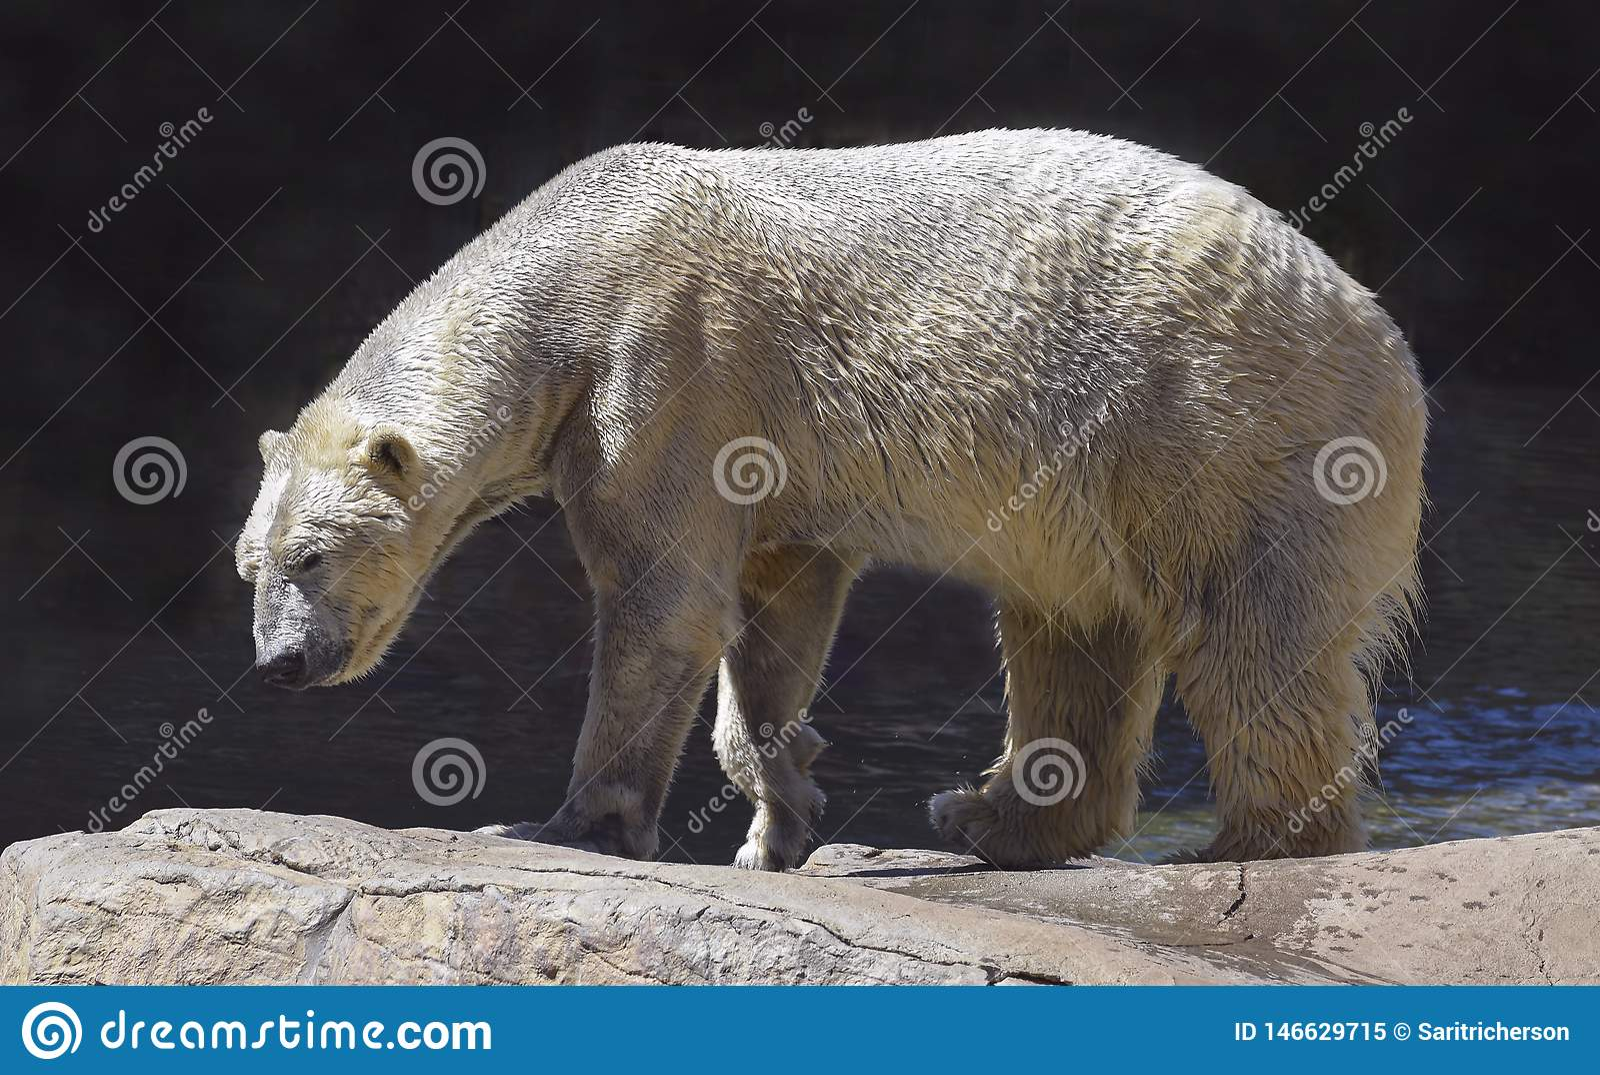 Wet Polar Bear Walking on Natural Boulders